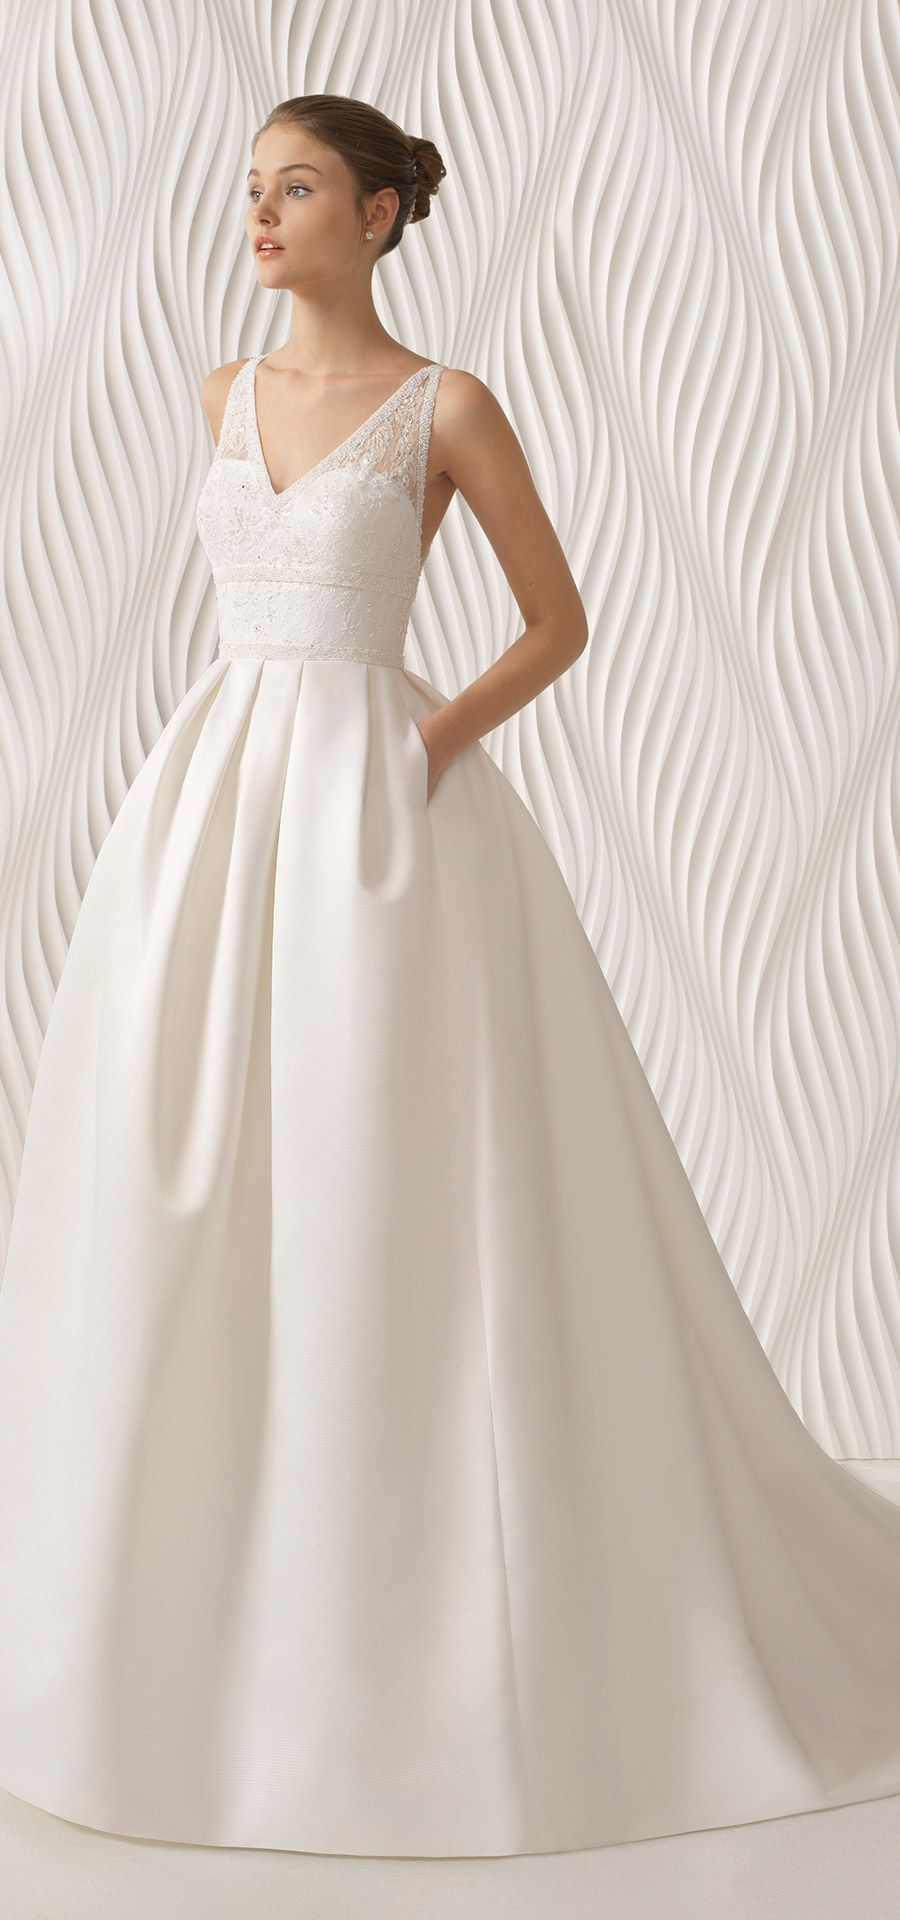 17+ Rosa clara wedding dresses prices info